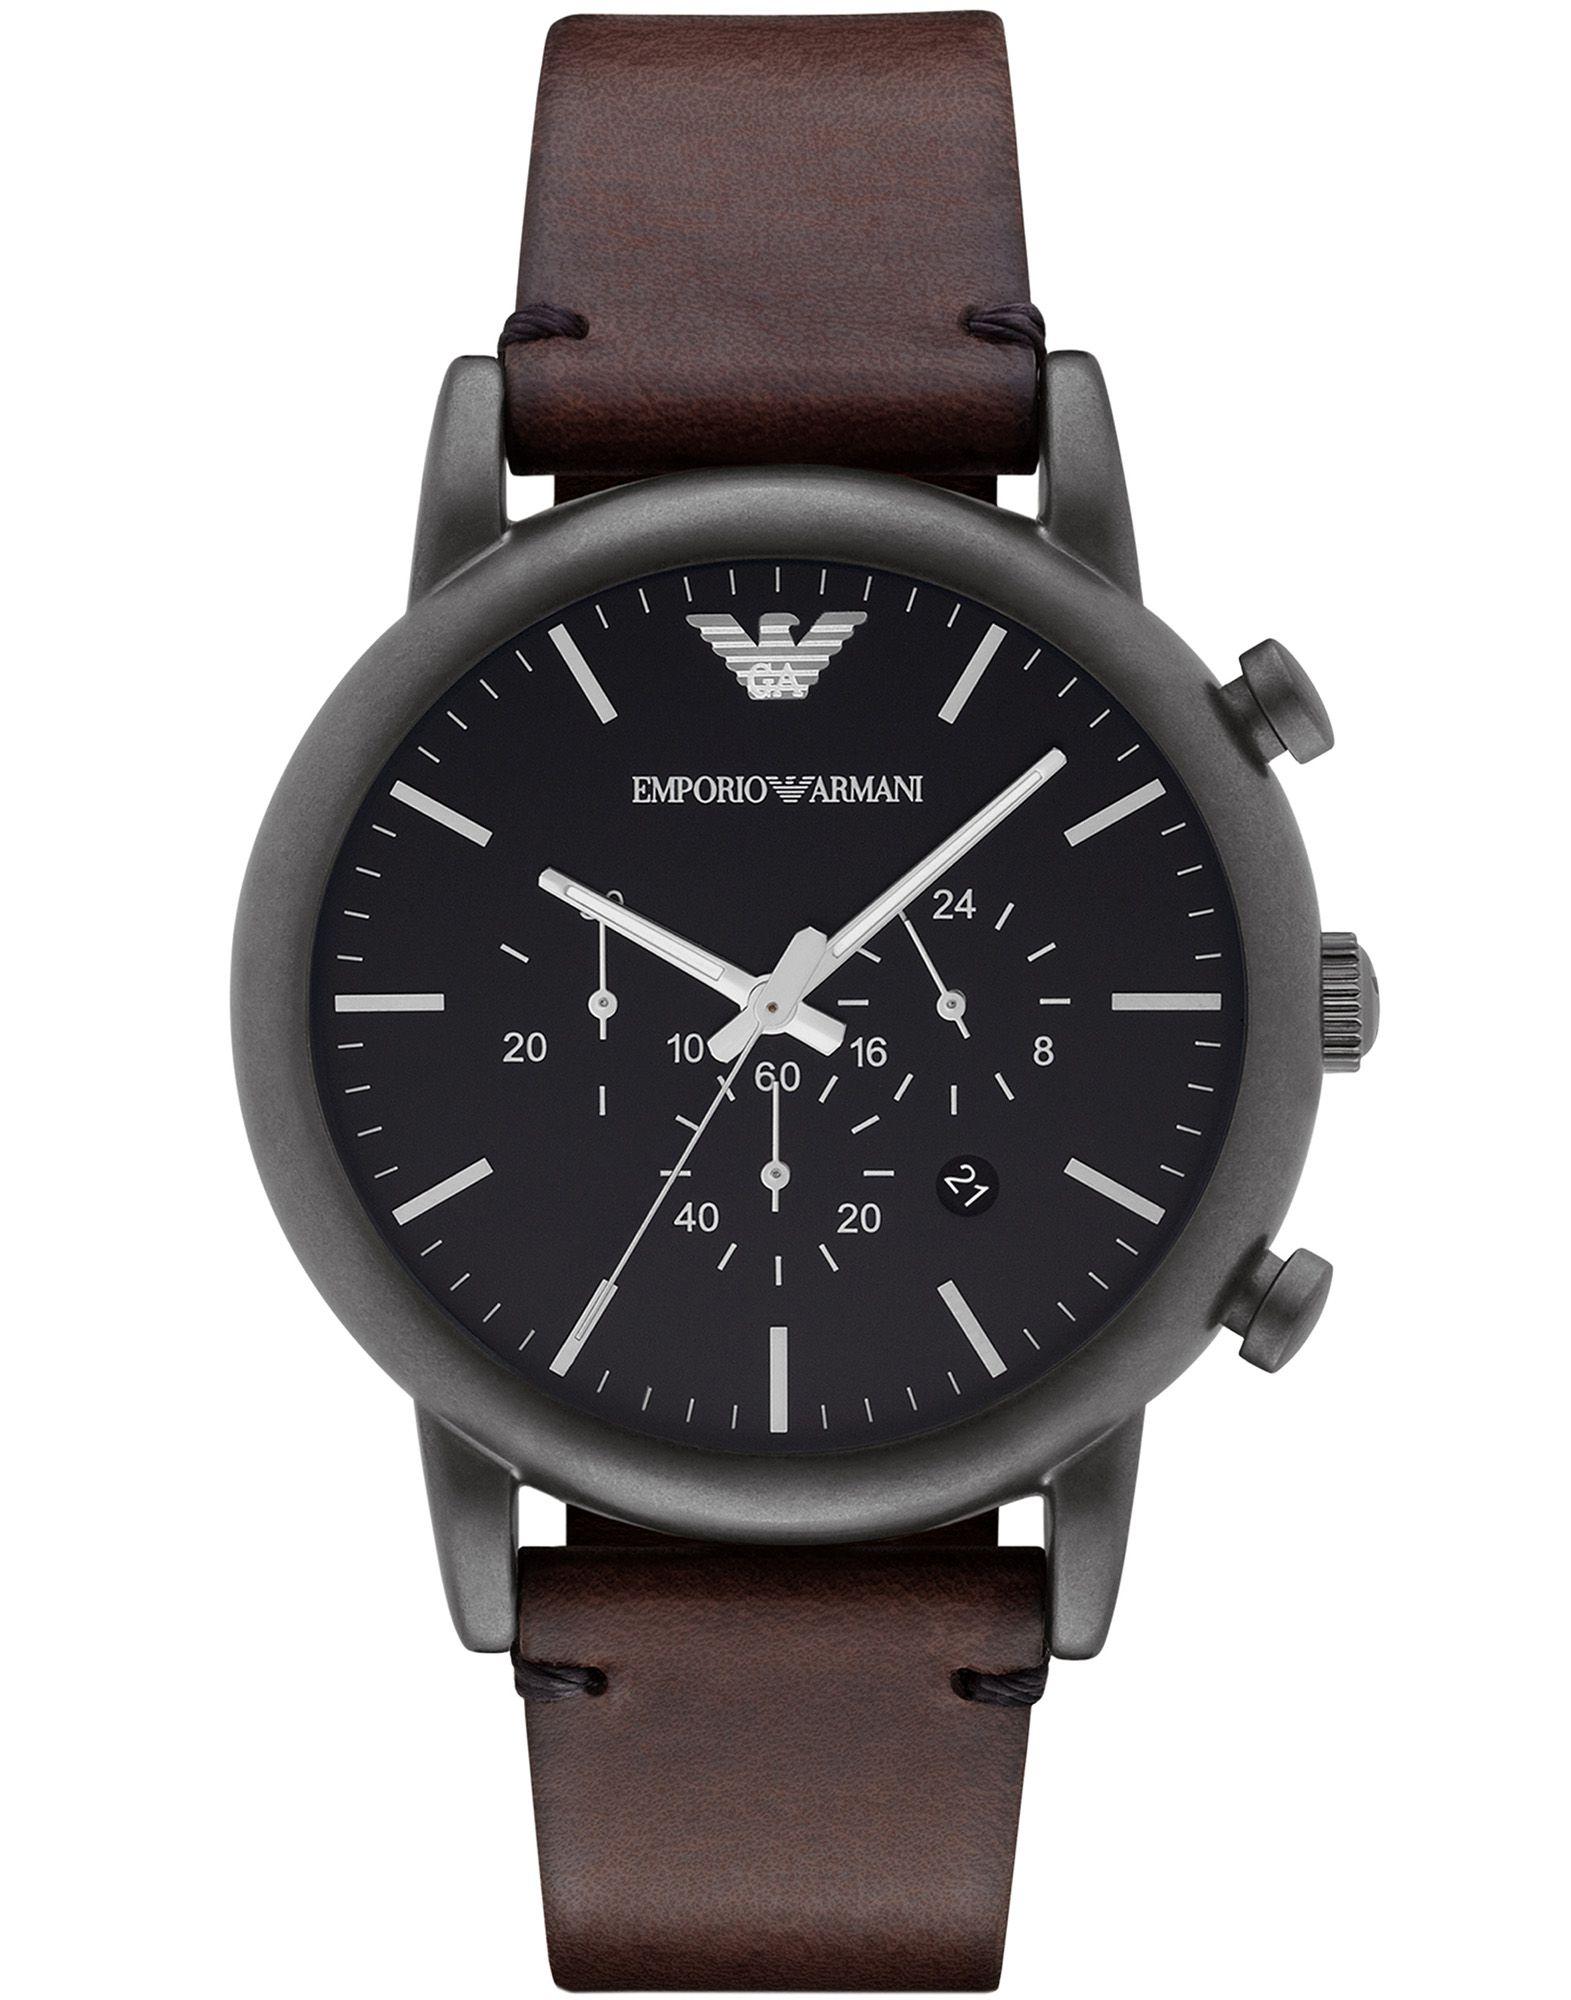 EMPORIO ARMANI Наручные часы emporio armani наручные часы